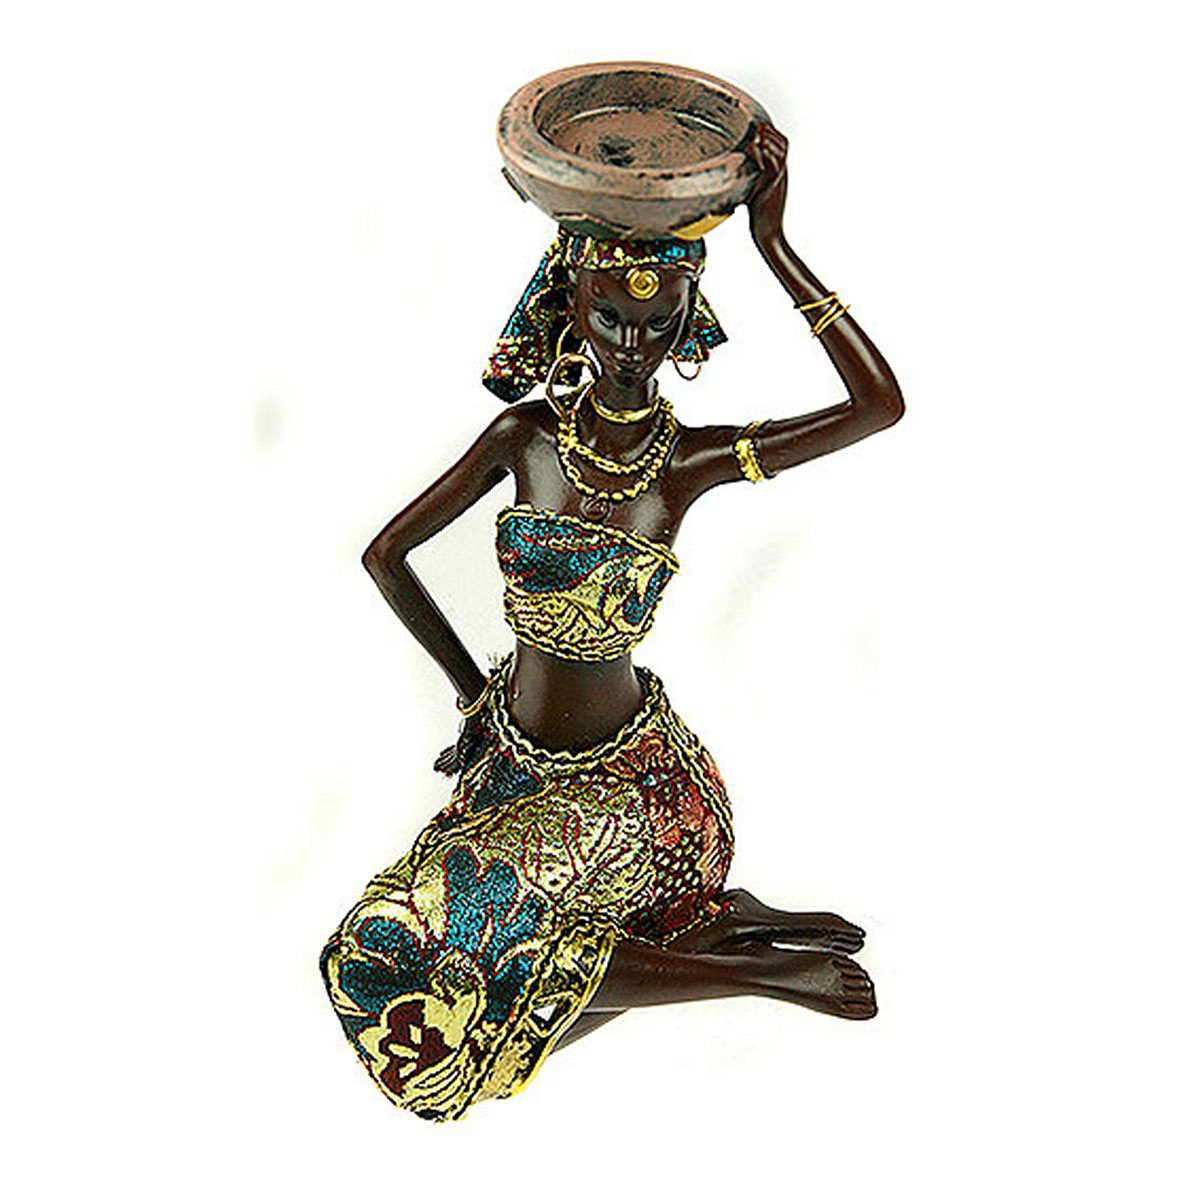 Статуэтка Русские Подарки Африканка, 14 х 15 х 22 см статуэтка lefard африканка 174 311